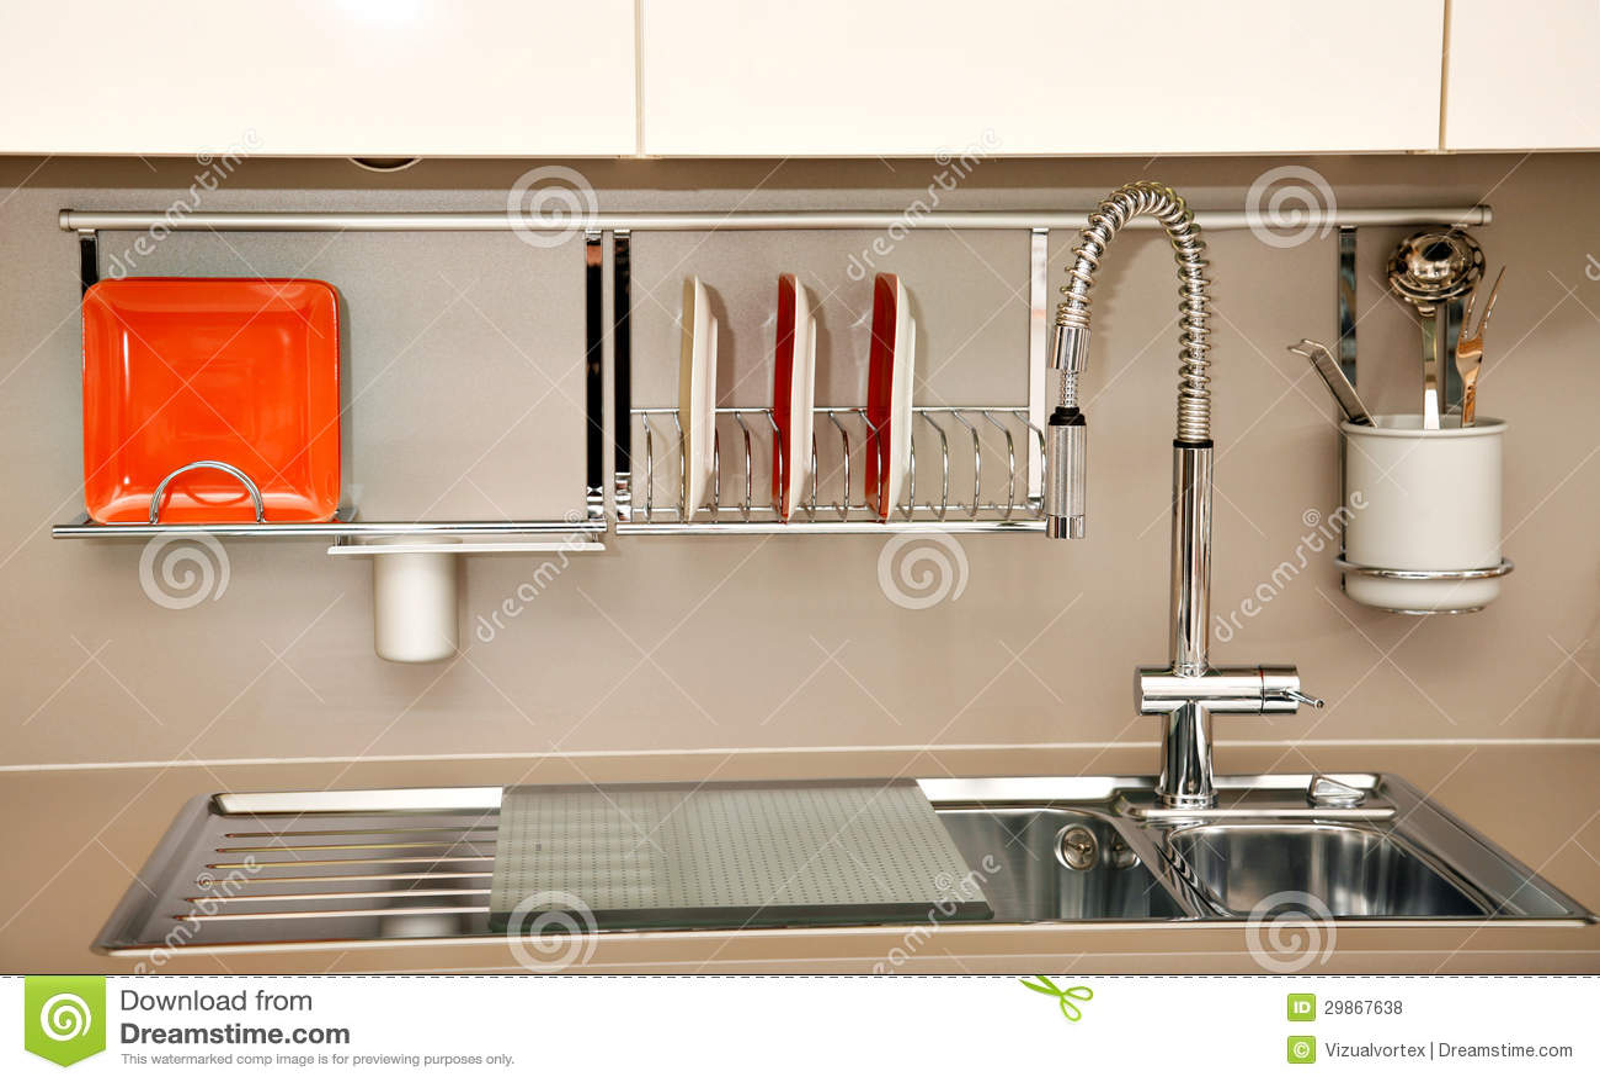 Kitchen sink stock photo. Image of modern, minimalist - 29867638